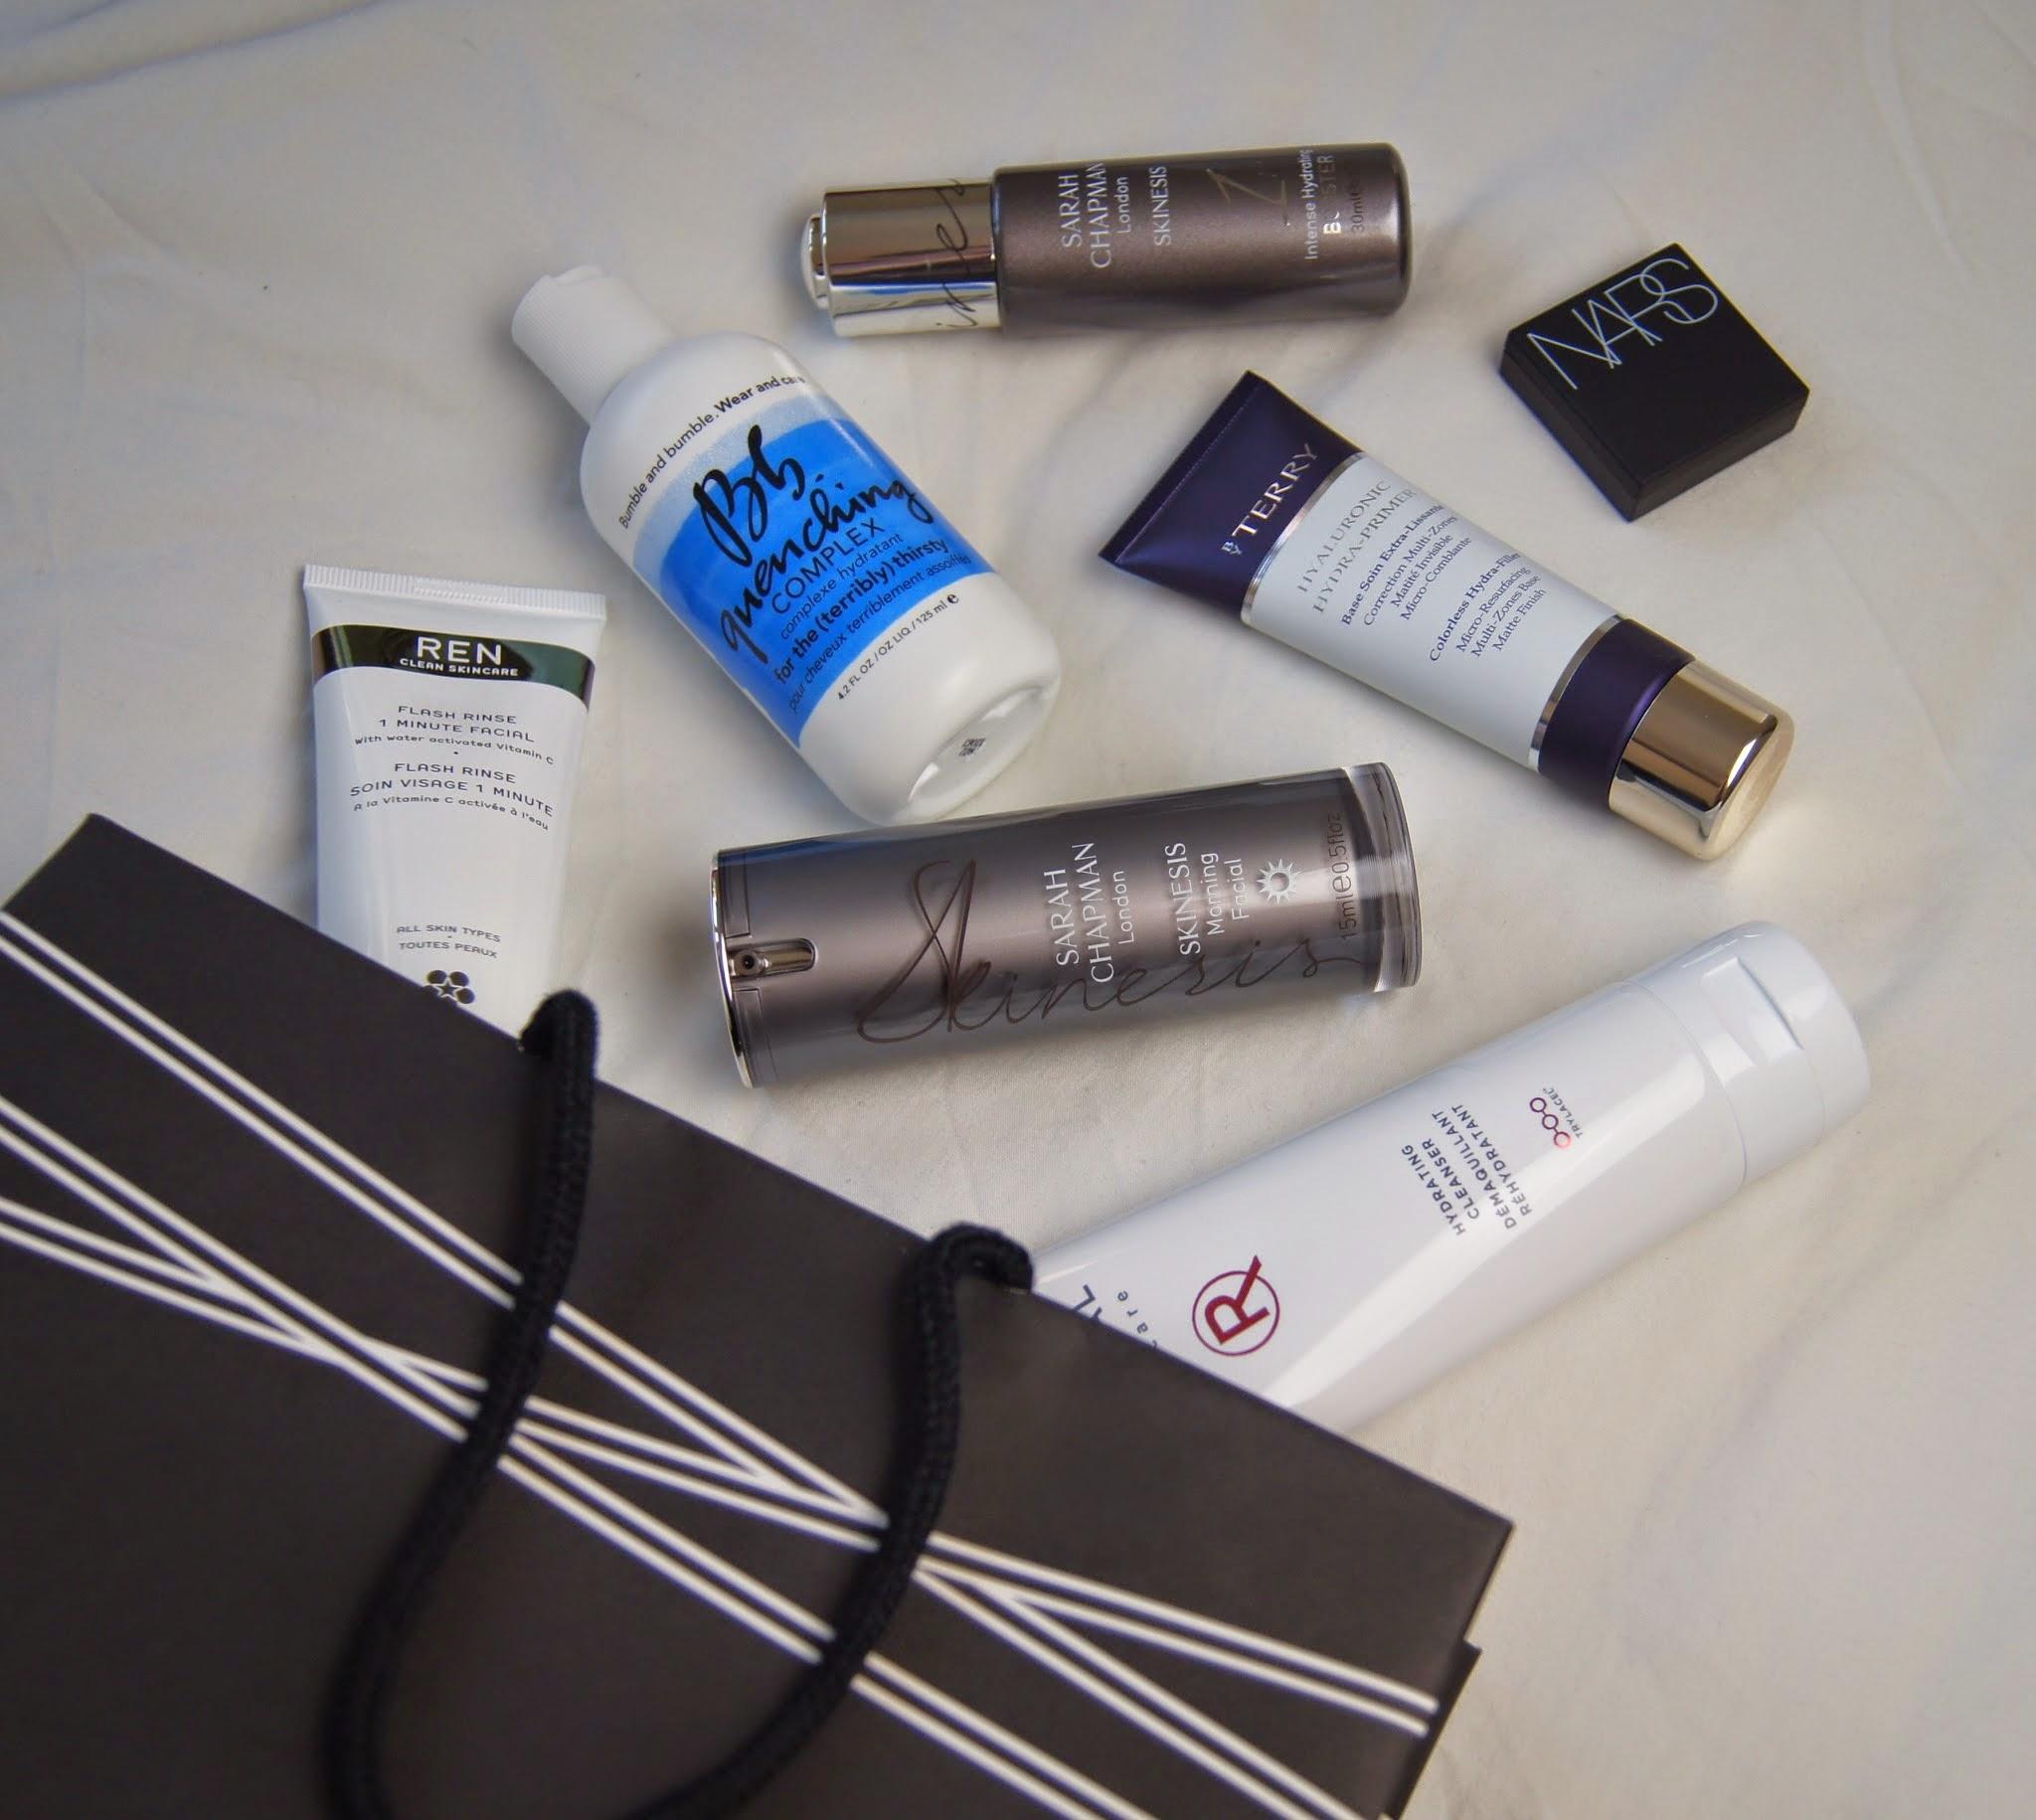 Space NK splurge beauty haul Nars By Terry Sarah Chapman REN Skincare Radical Bumble & Bumble